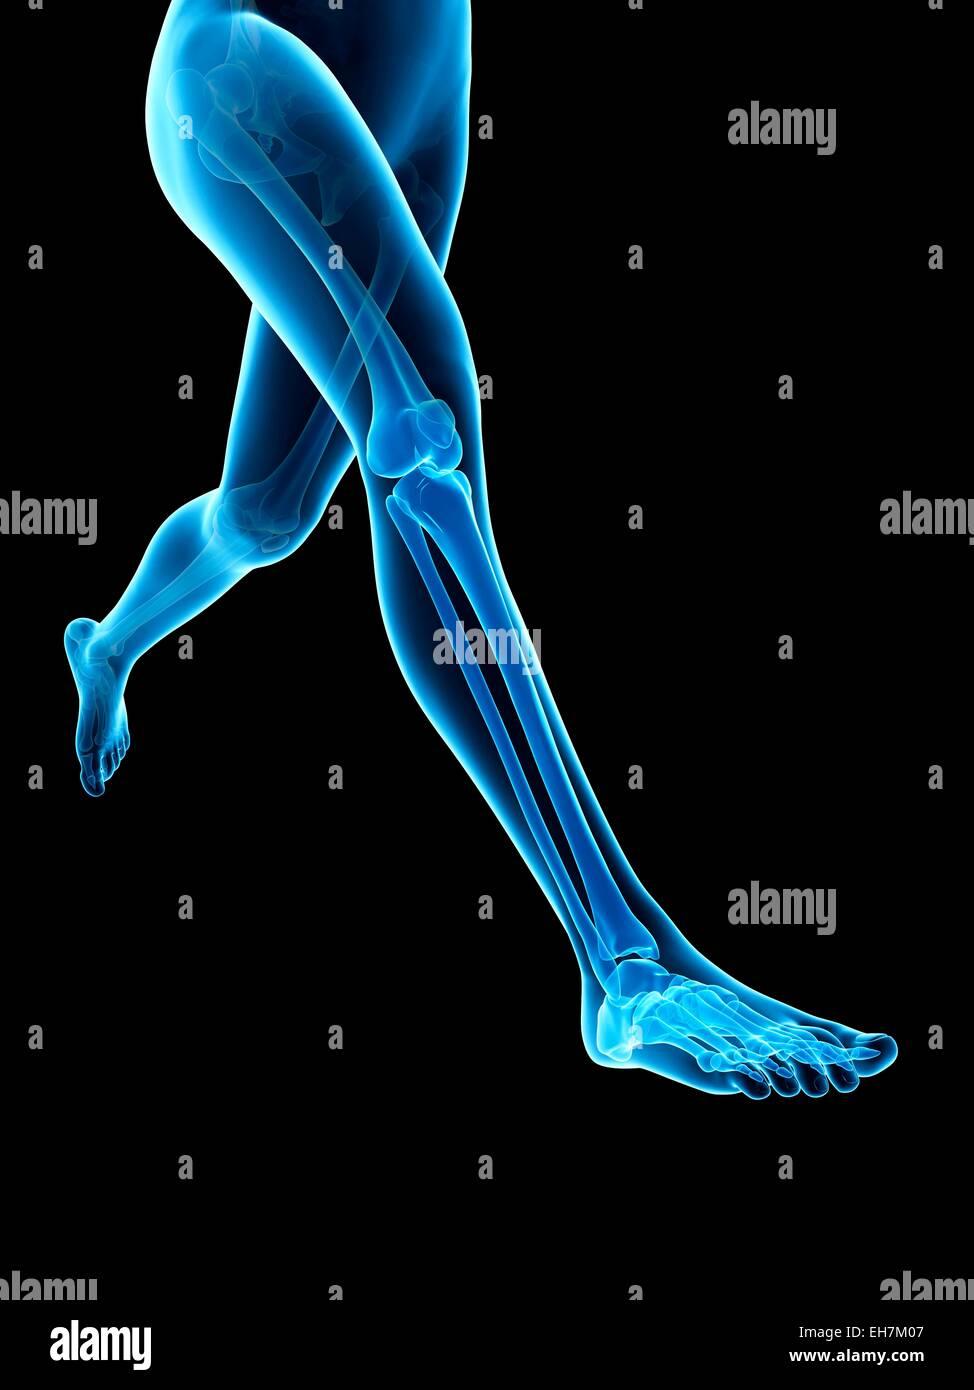 Human Leg Bones Illustration Stock Photo 79459975 Alamy